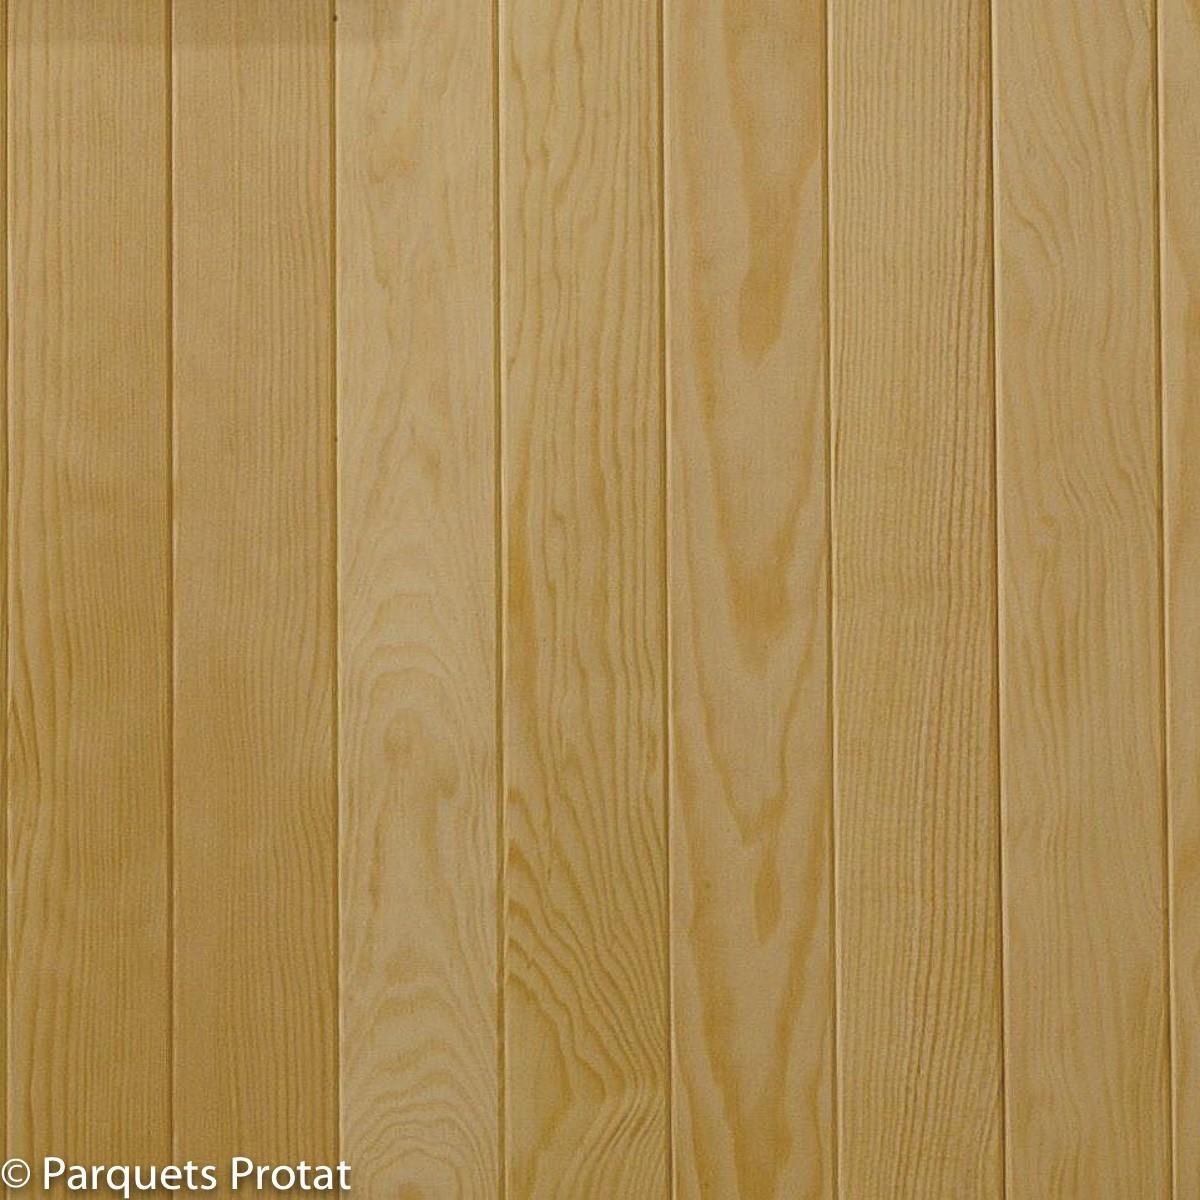 parquet pin perfect parquet en pin maritime with parquet pin trendy p with parquet pin latest. Black Bedroom Furniture Sets. Home Design Ideas